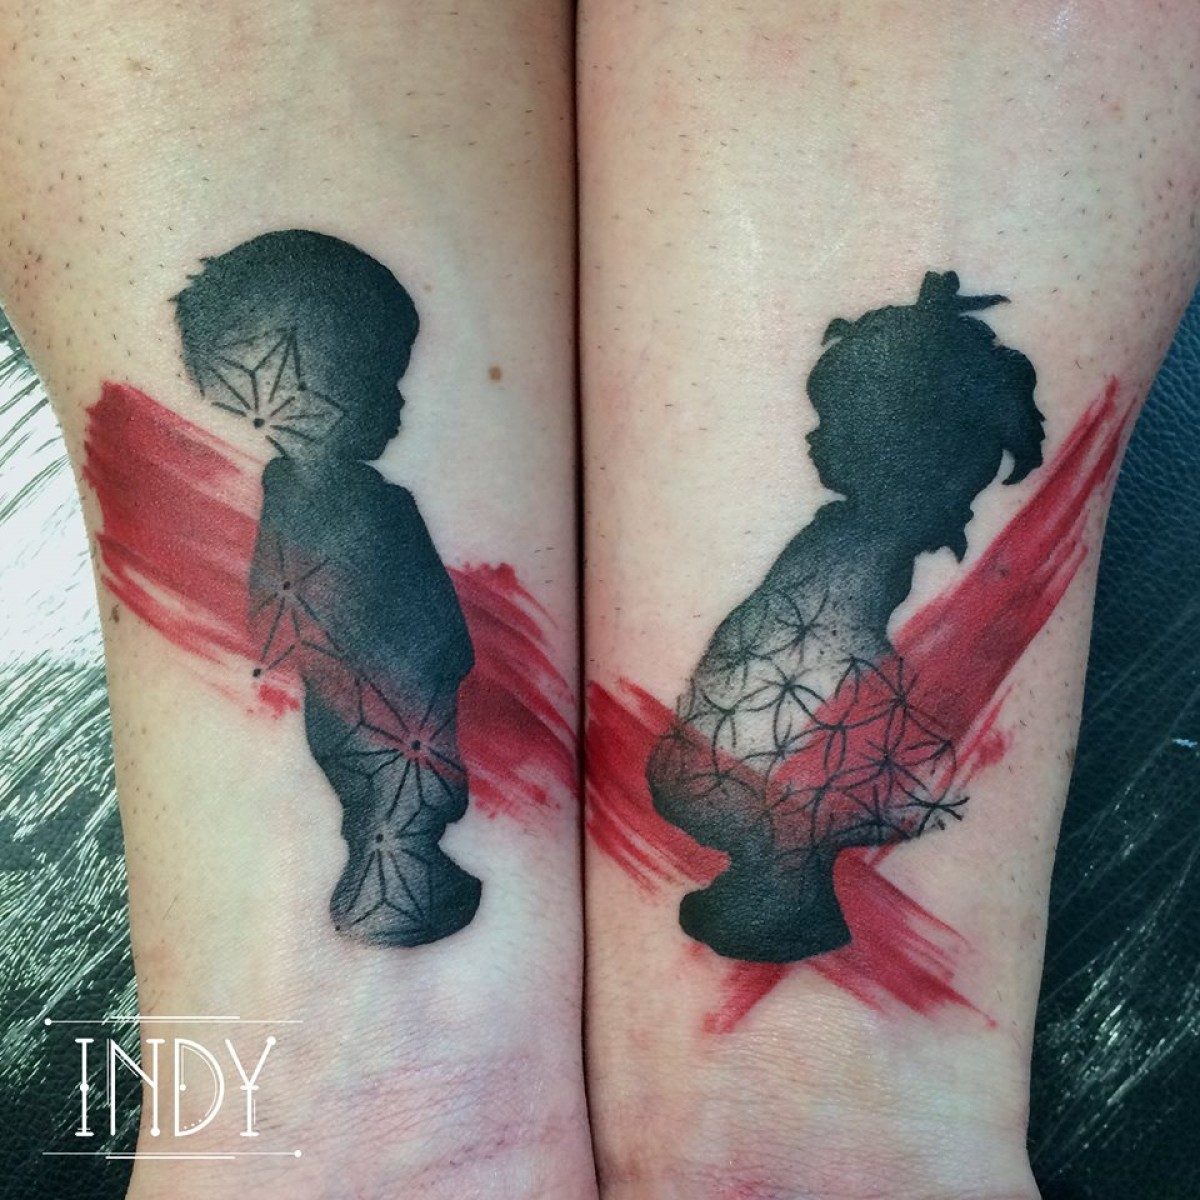 Tattoo soeur galerie tatouage - Tatouage de soeur ...